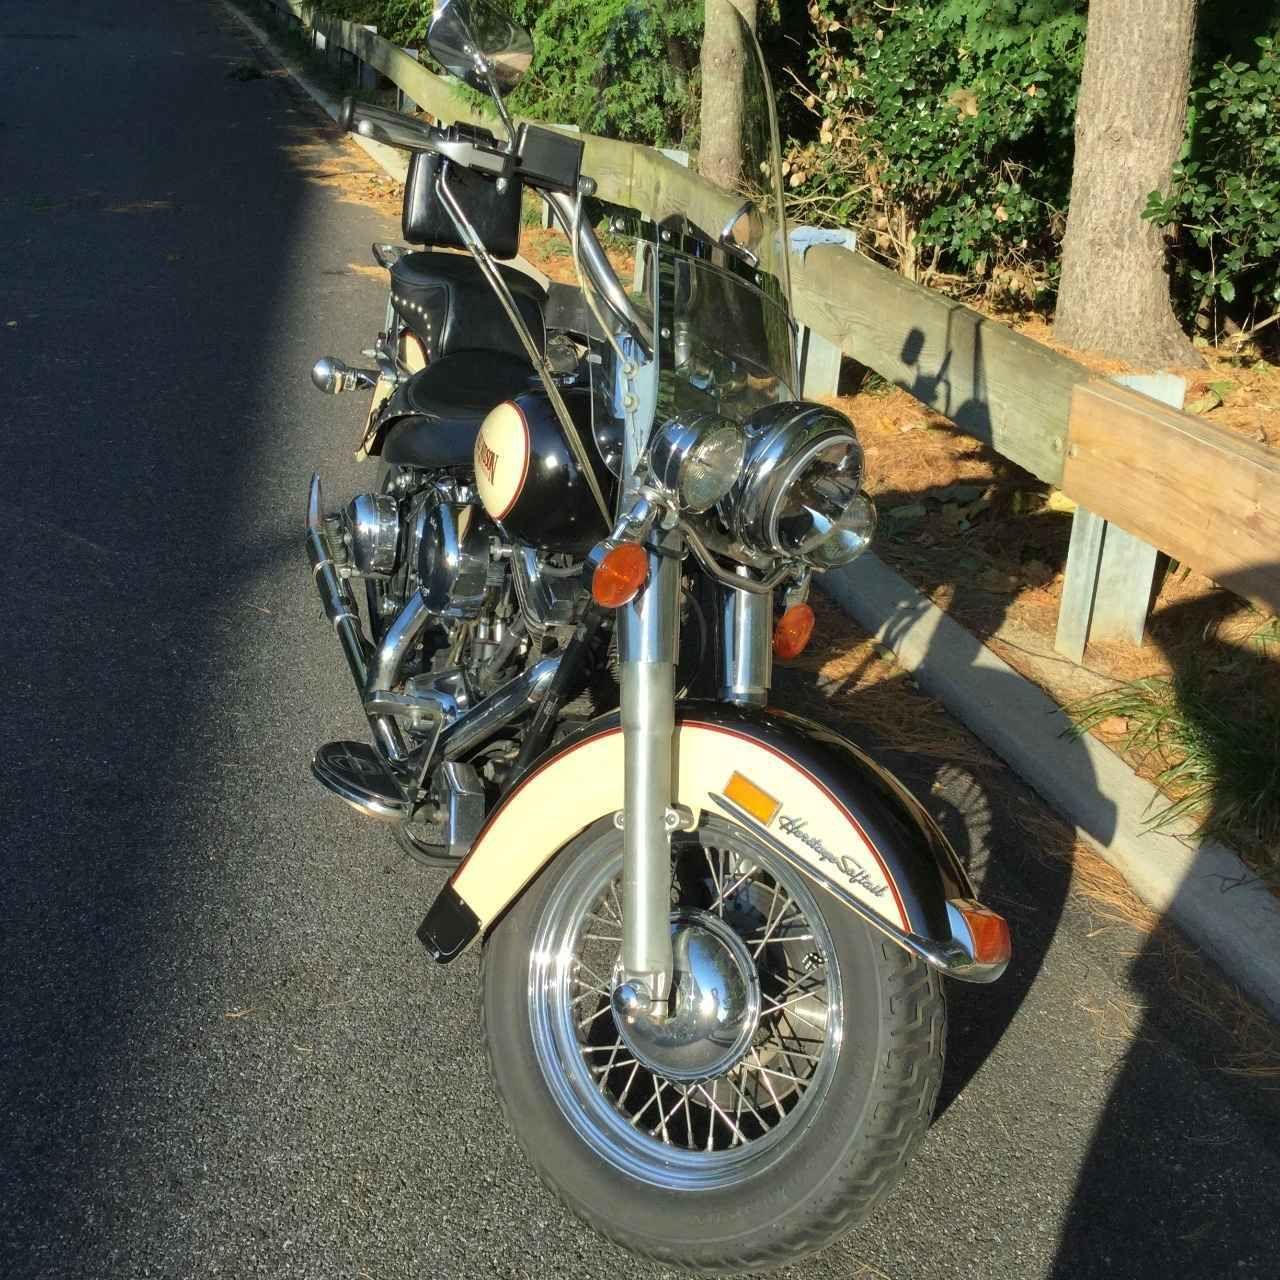 1989 Harley Davidson Heritage Softail Classic Softail Harley Davidson Harley [ 1280 x 1280 Pixel ]